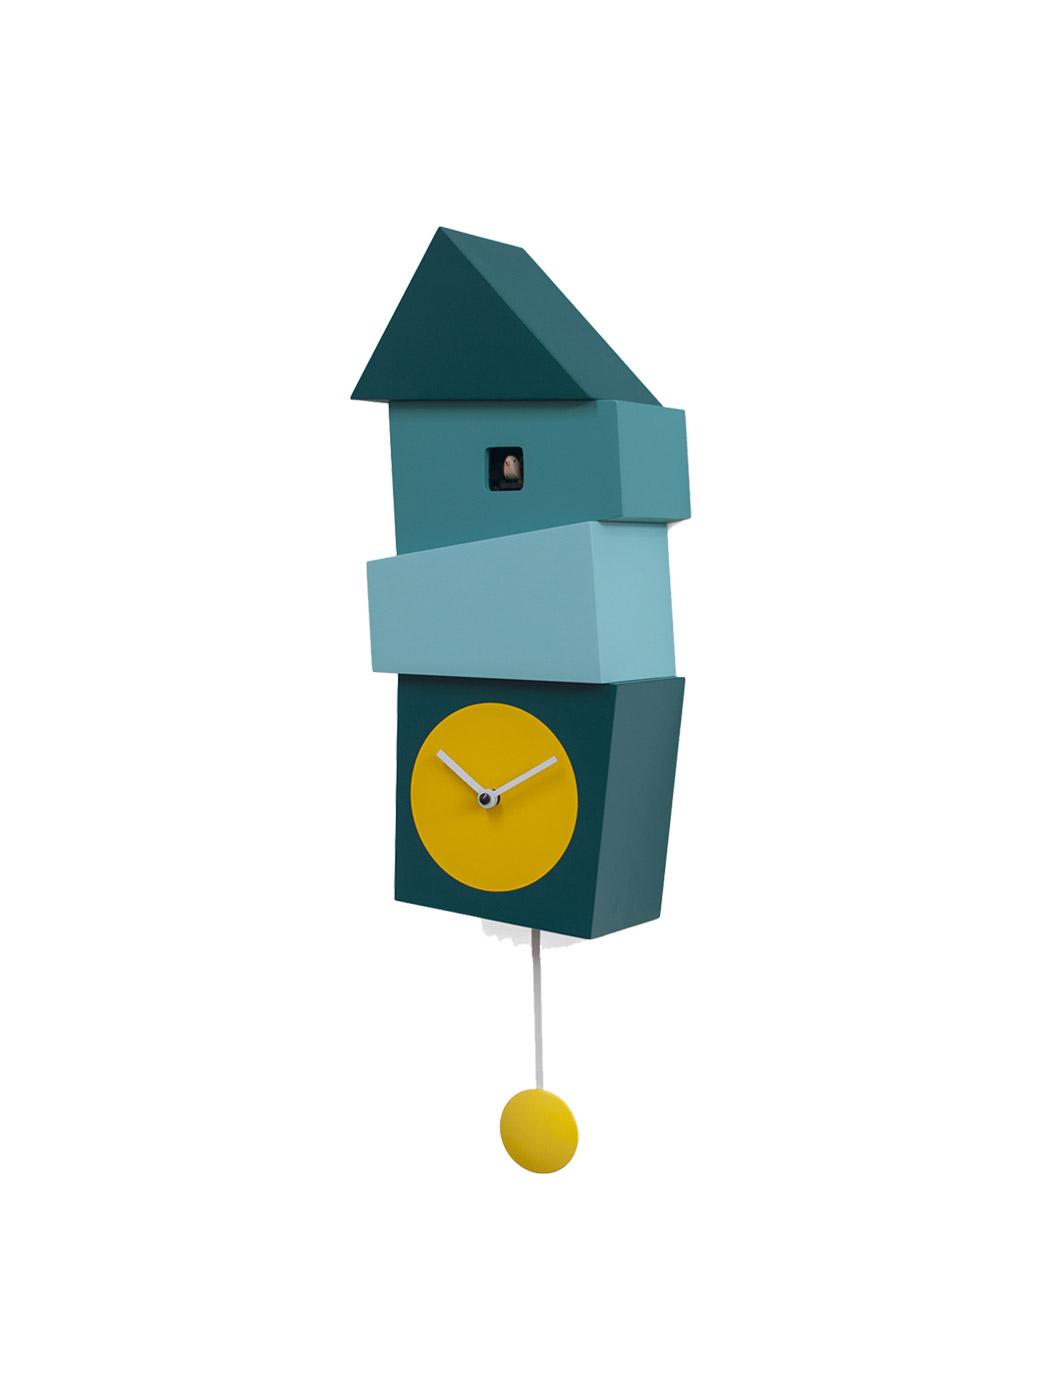 crooked cuckoo clock progetti blue yellow side